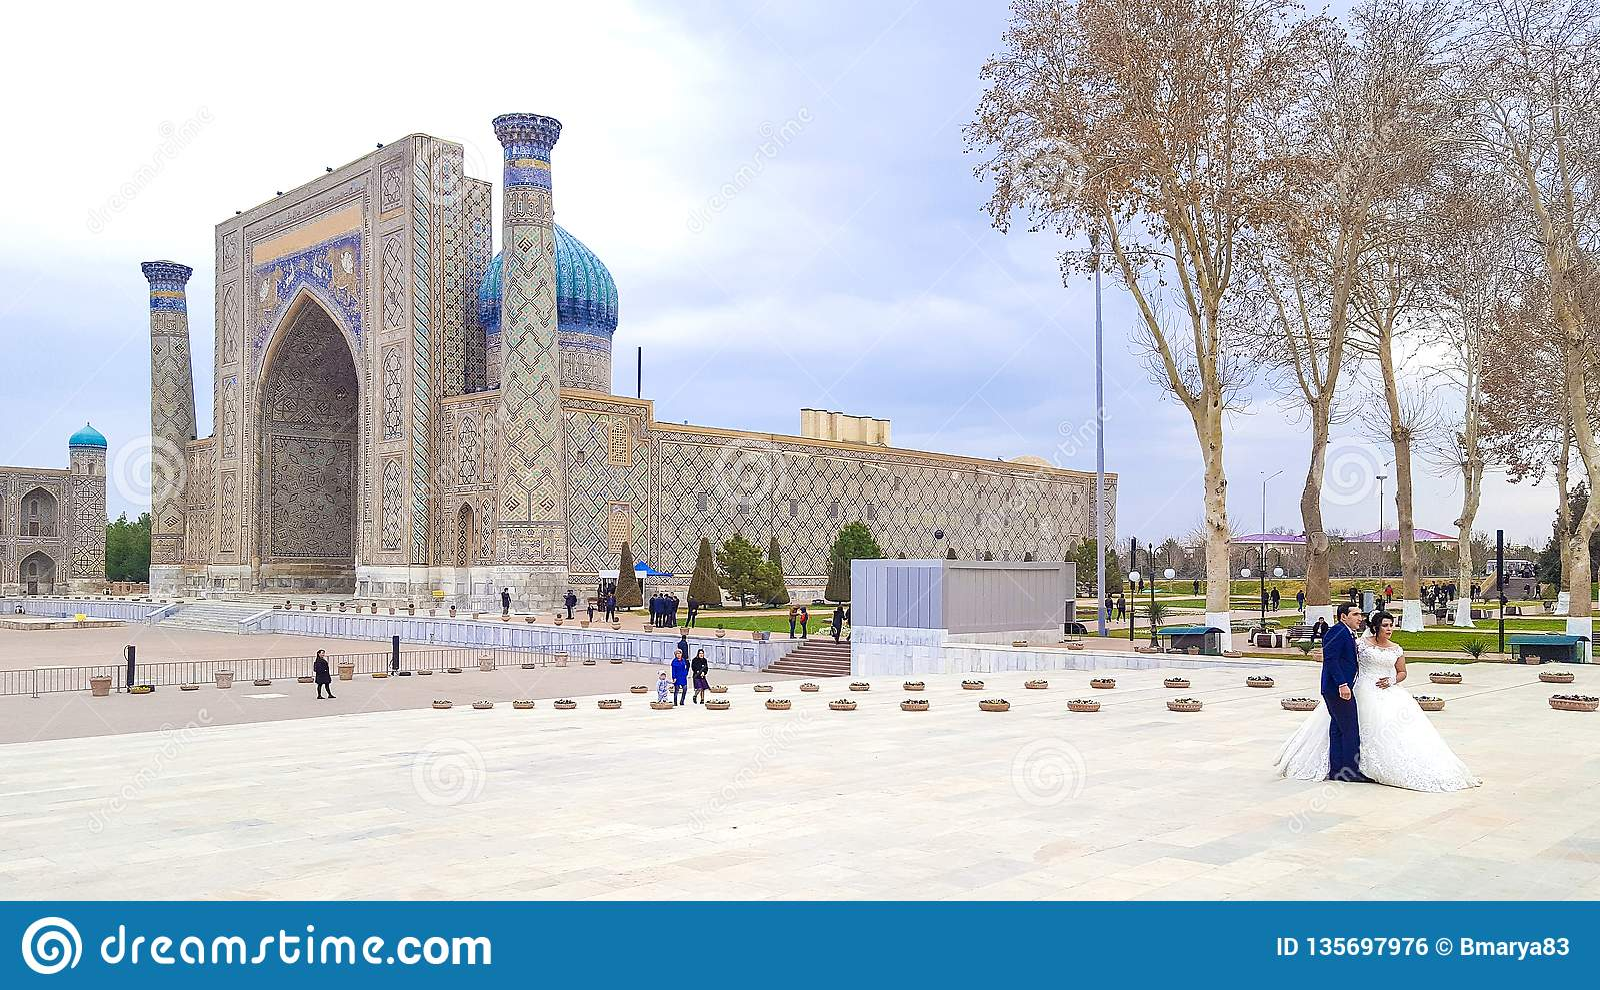 December 2018, Uzbekistan, Samarkand, Registan Square, Madrasa Sherdor `Resident of the Lions`